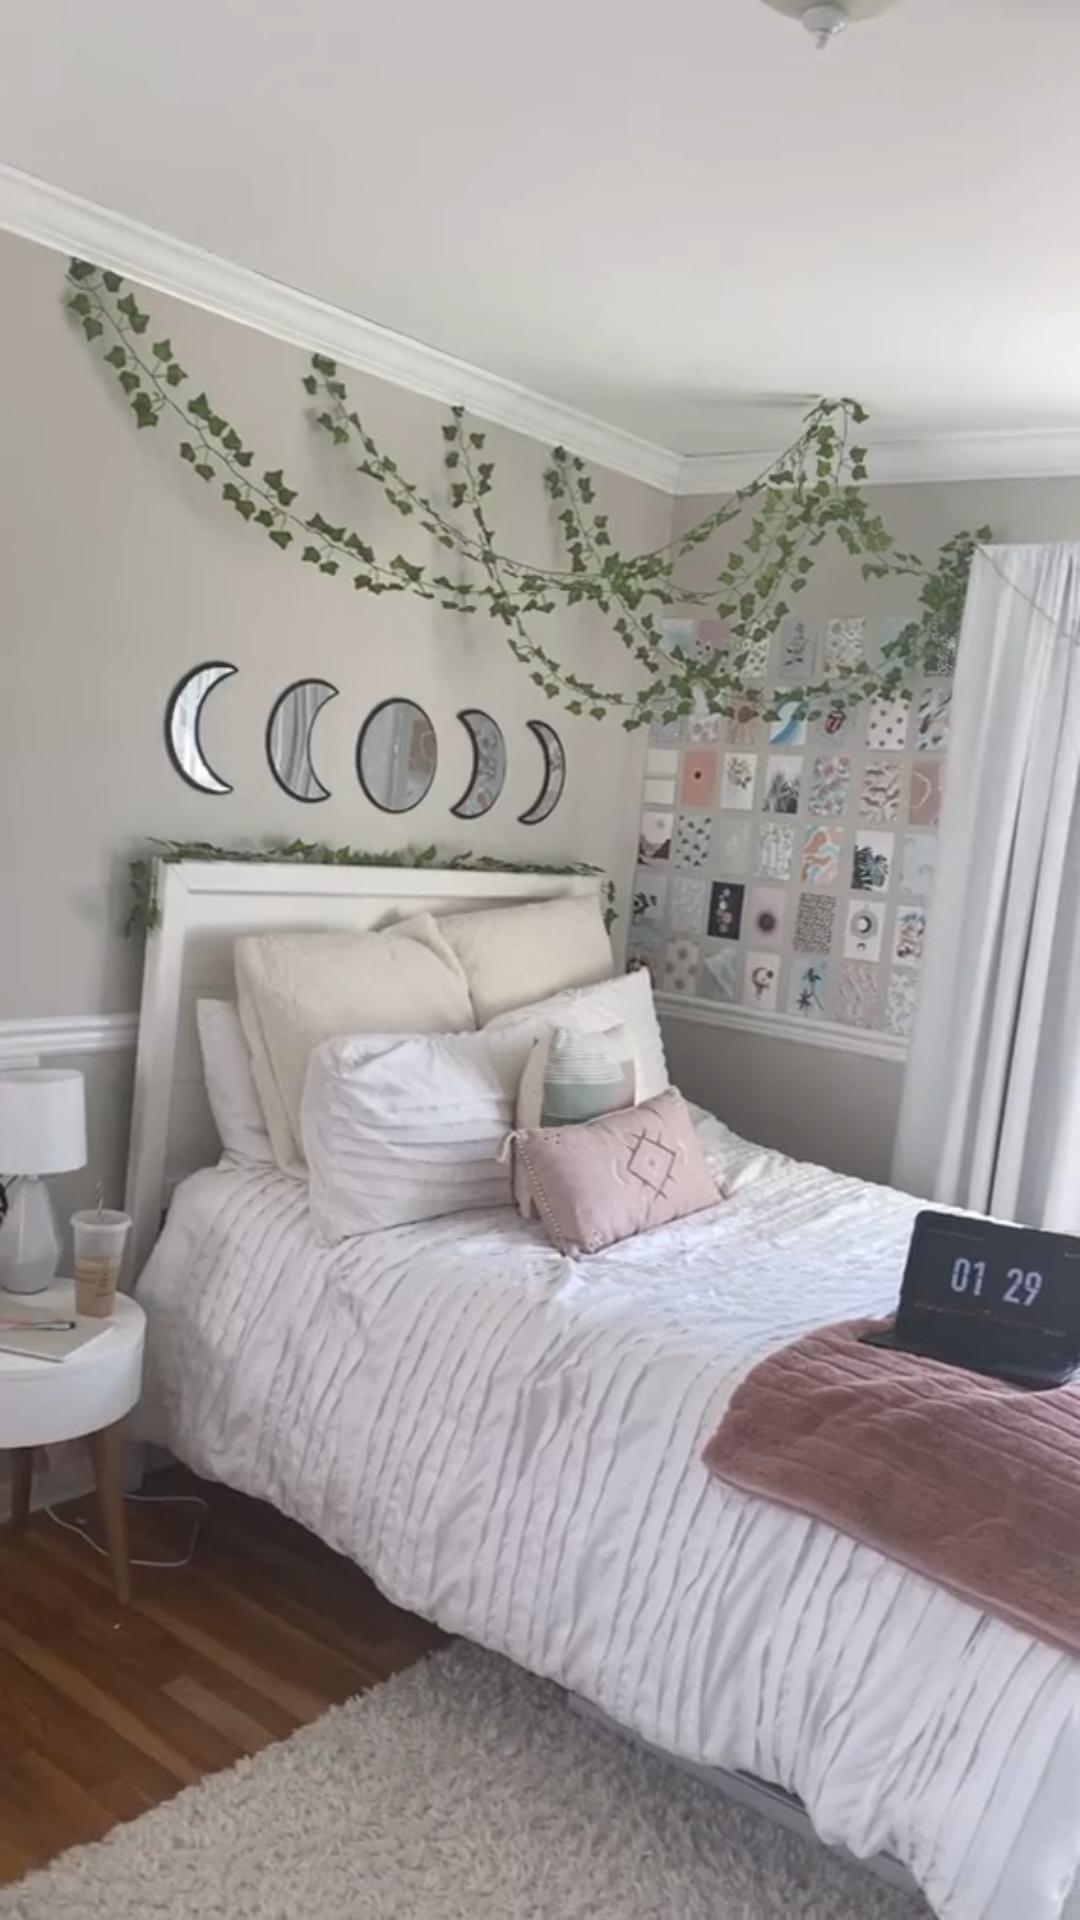 Boogzel Home - Indie Room Decor ideas